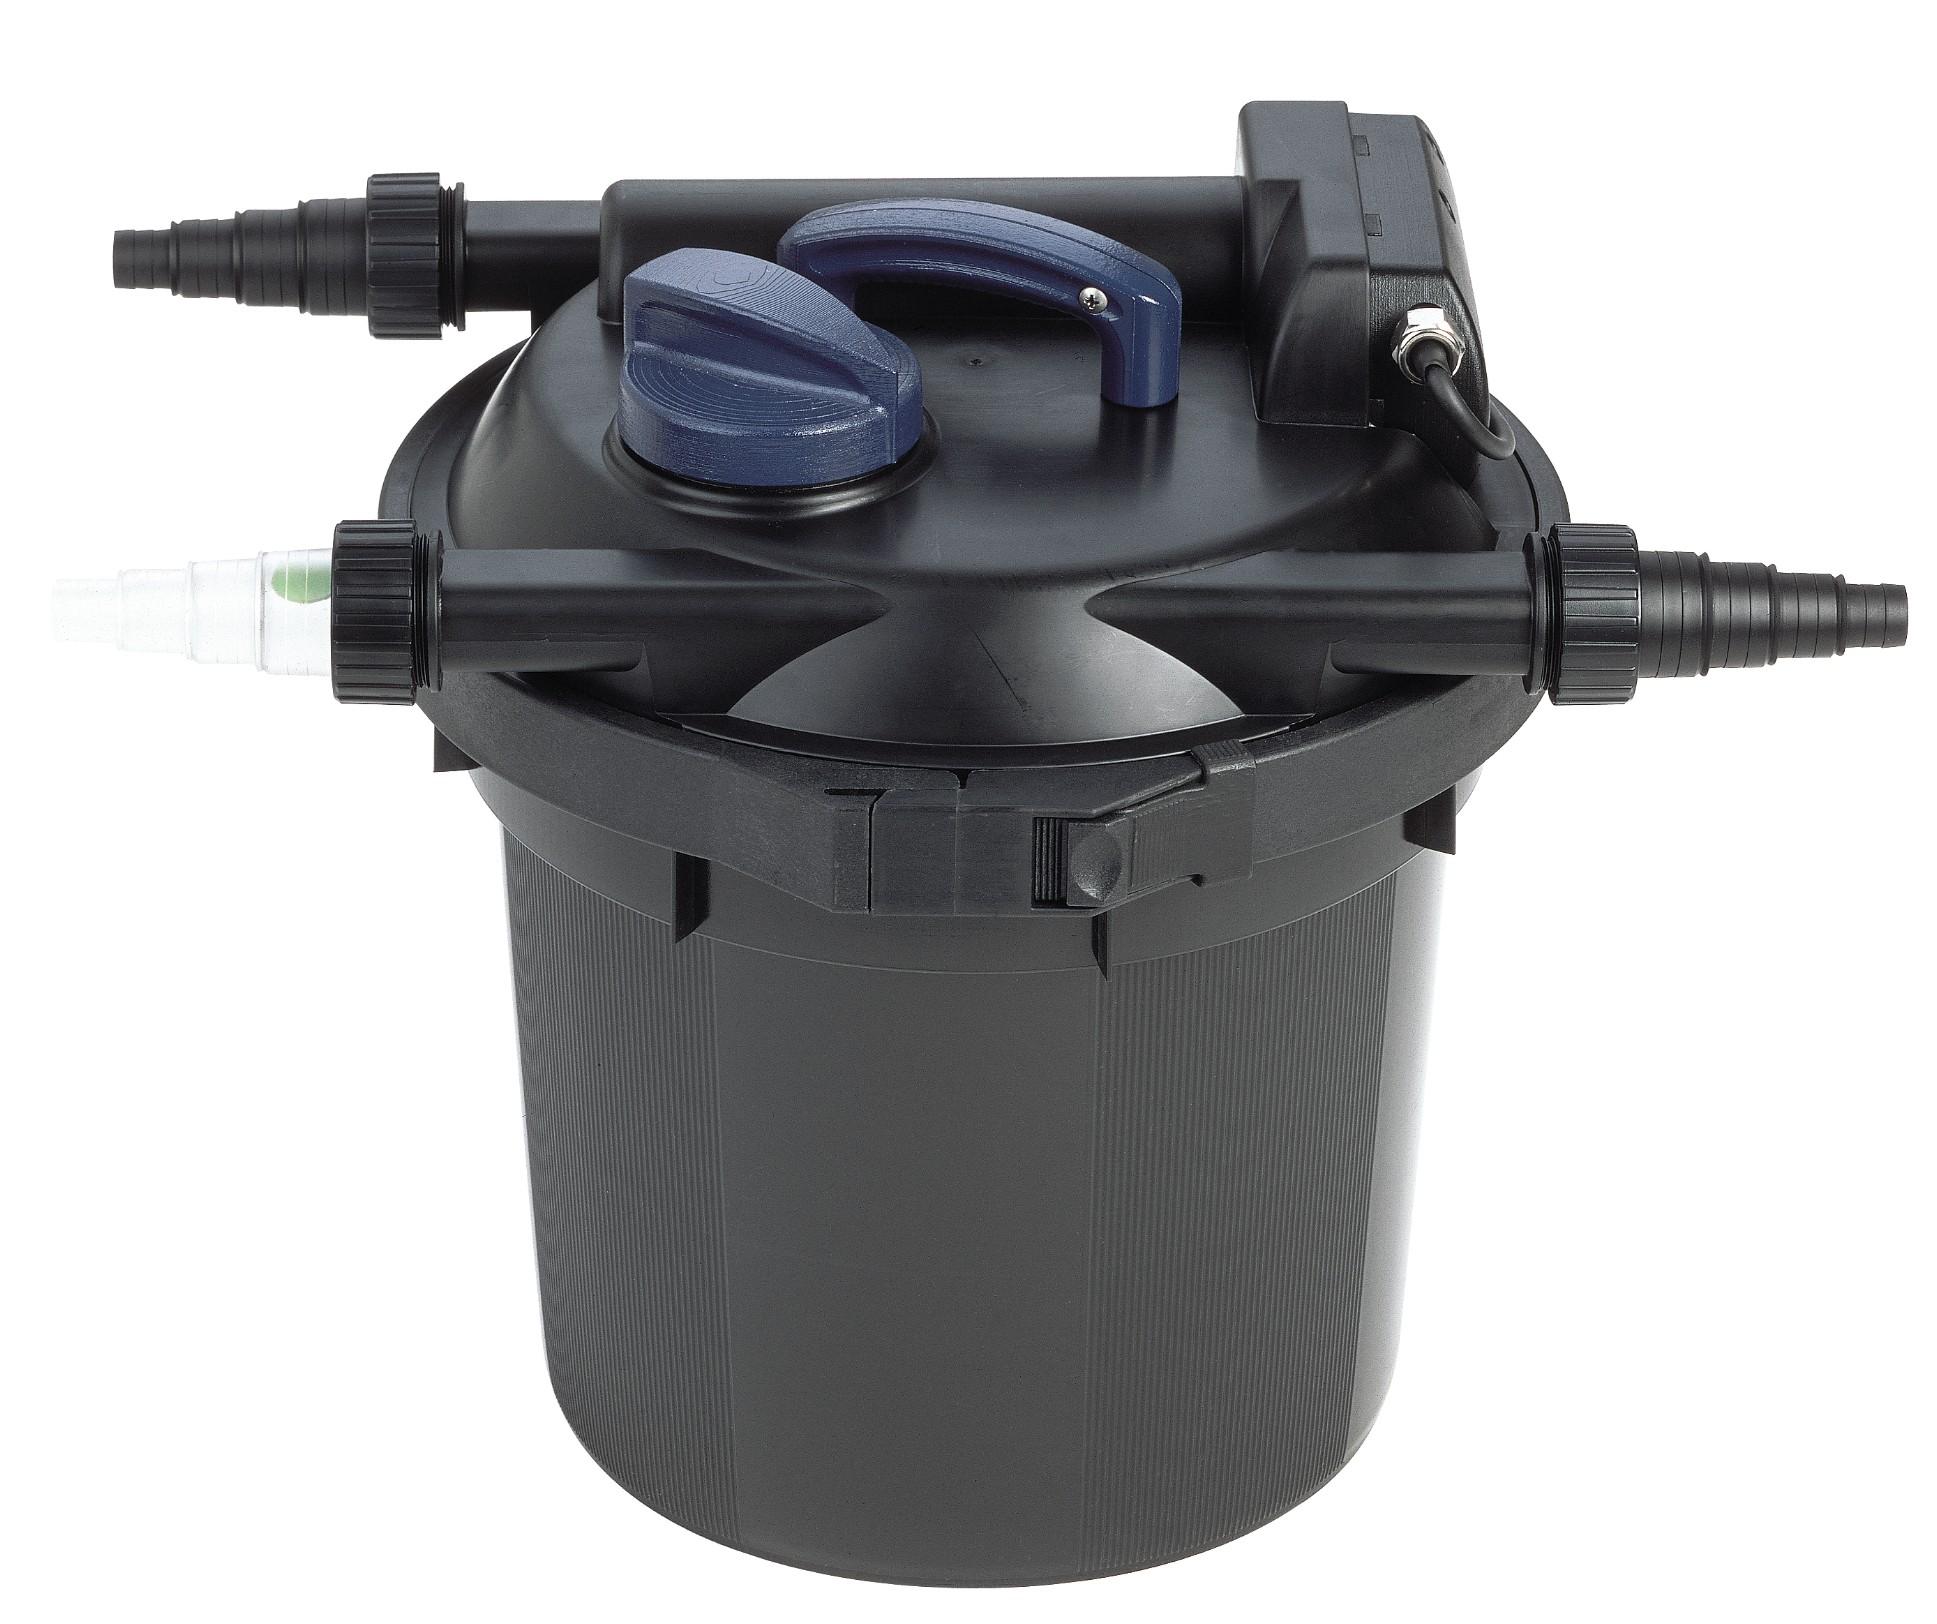 Oase filtoclear 6000 druckfilter 6qm 11 watt uvc for Oase teichpumpen shop